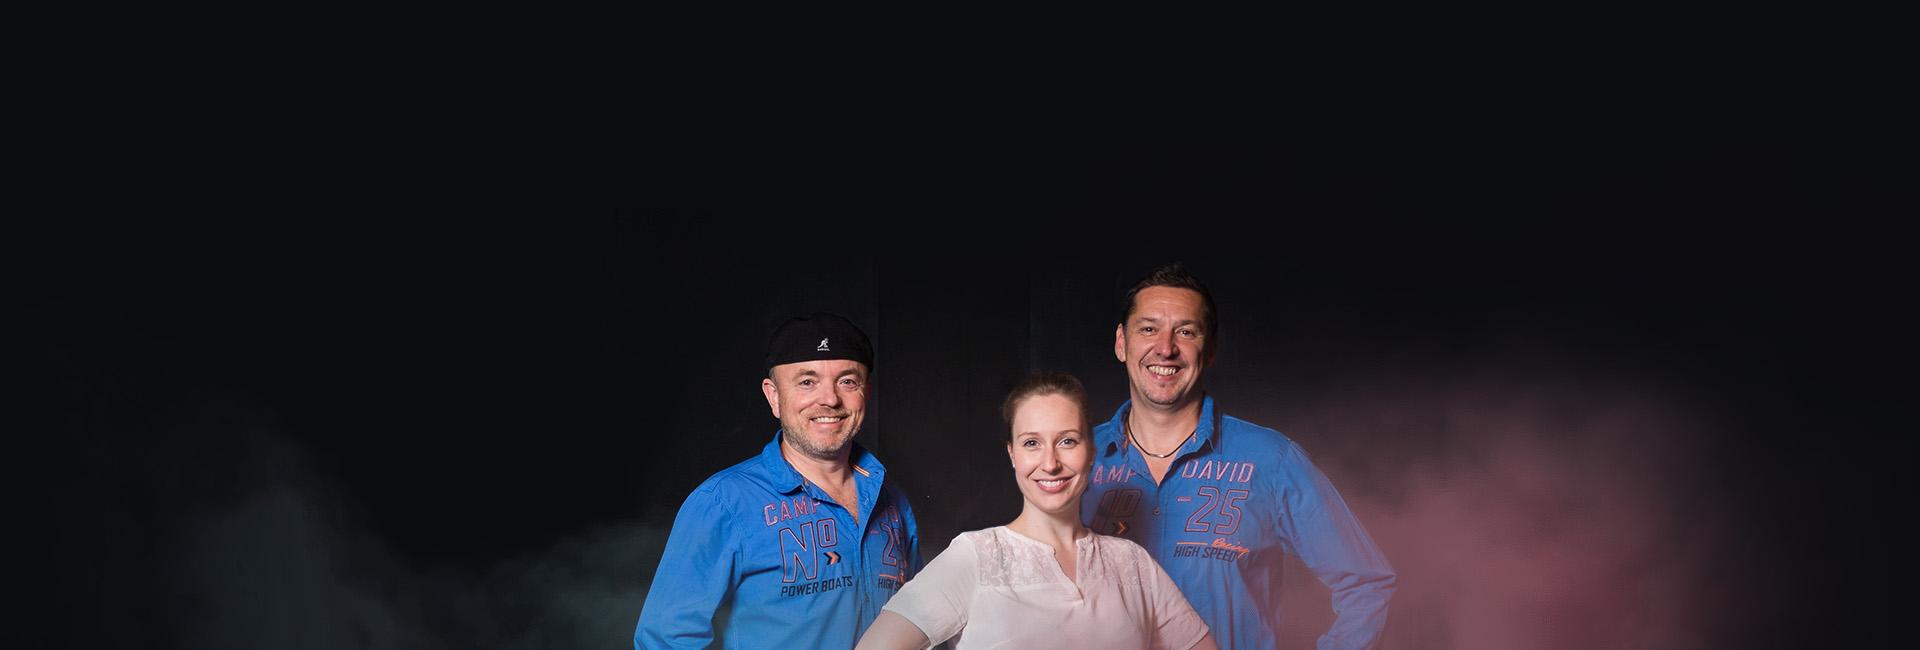 Eventband time4music - Partymusik mit Ramona, Axel und Ingo